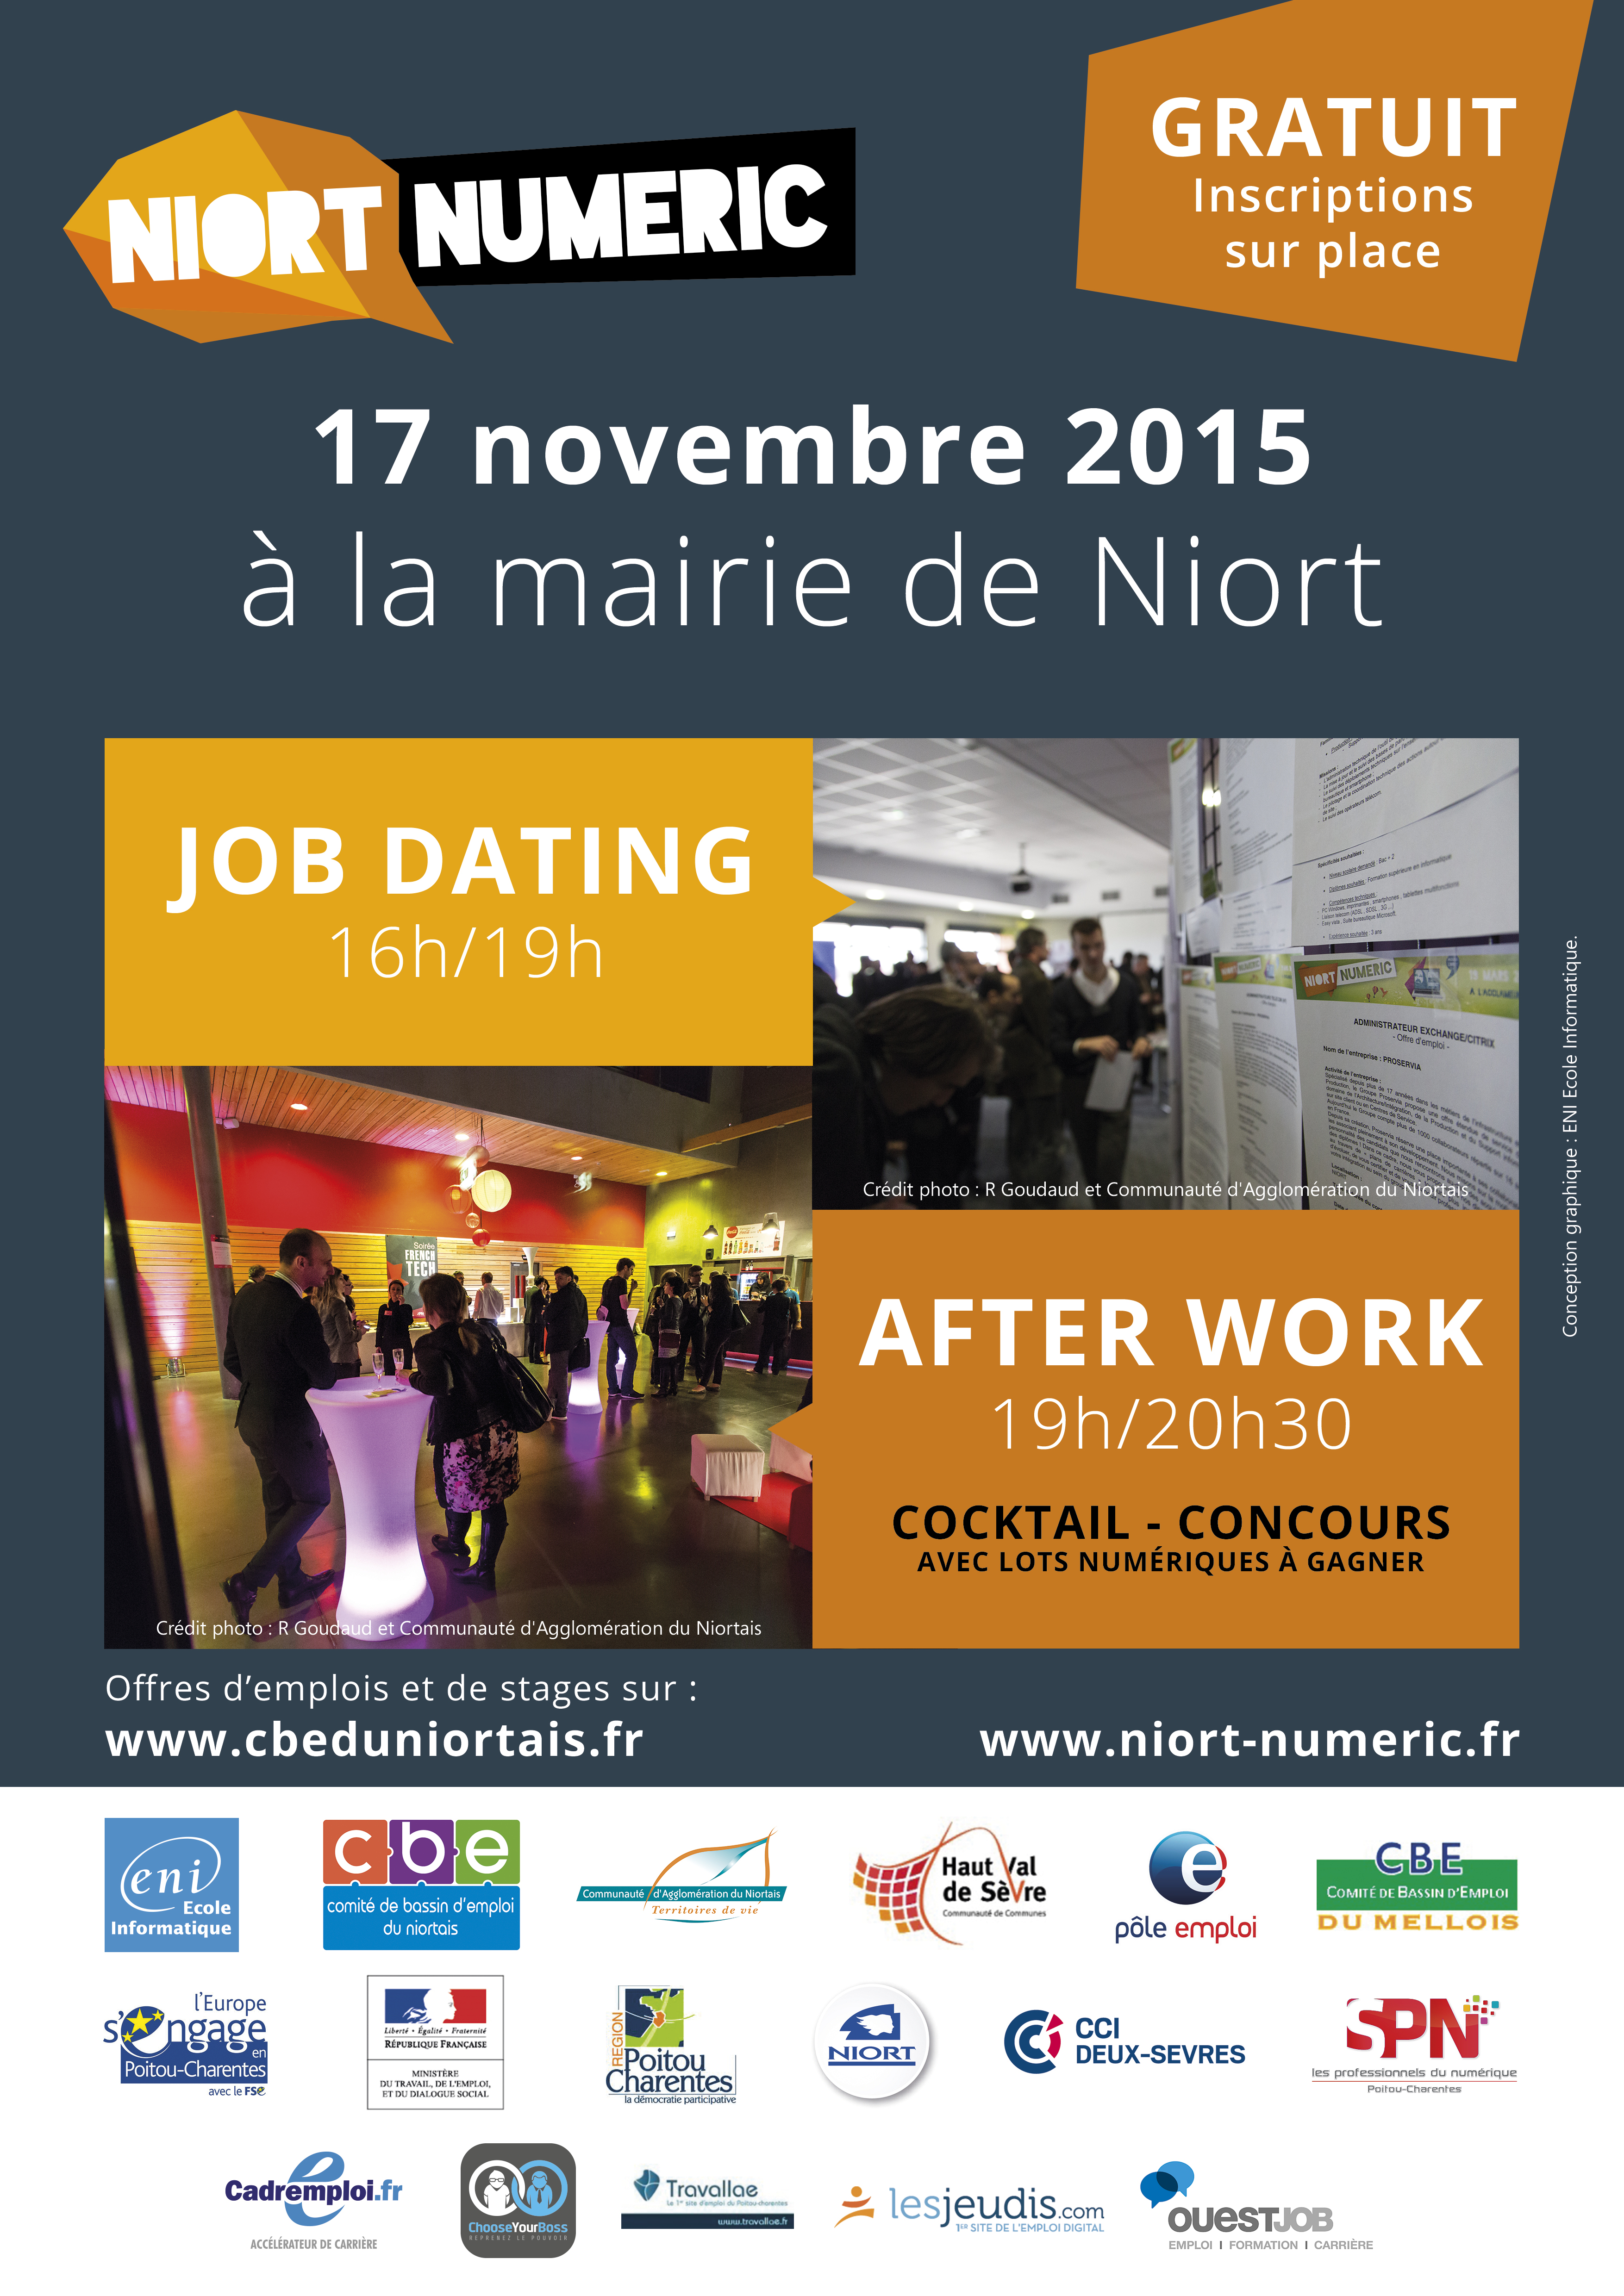 Affiche job dating Niort Numéric 2015